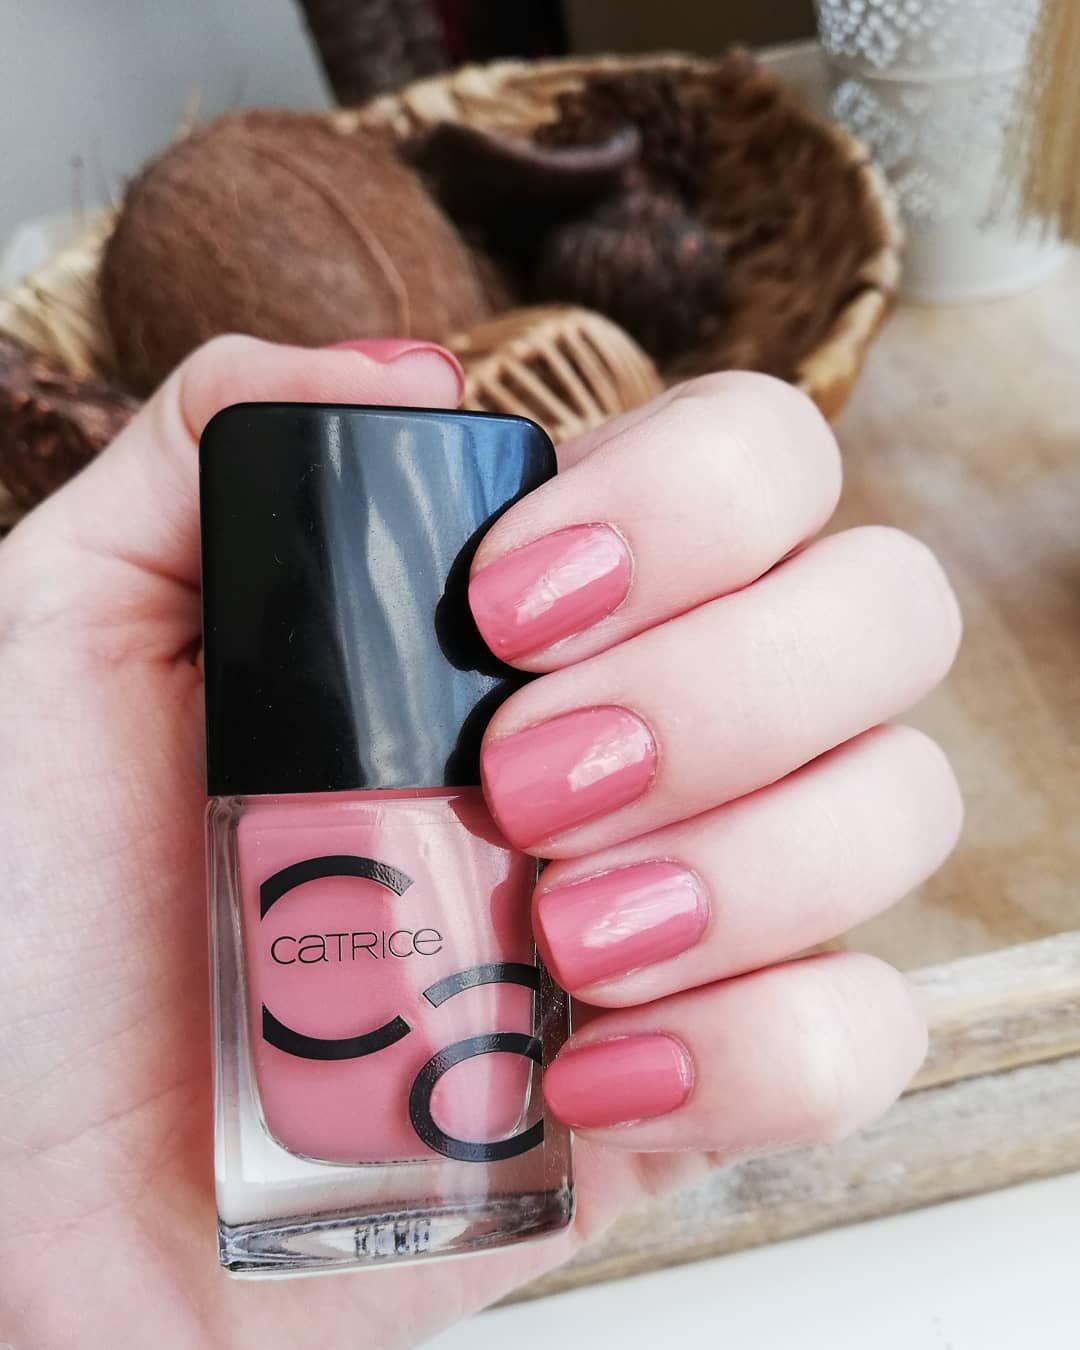 Catrice 09 Catrice Catricecosmetics Nailpolish Nails Manicure Autumn